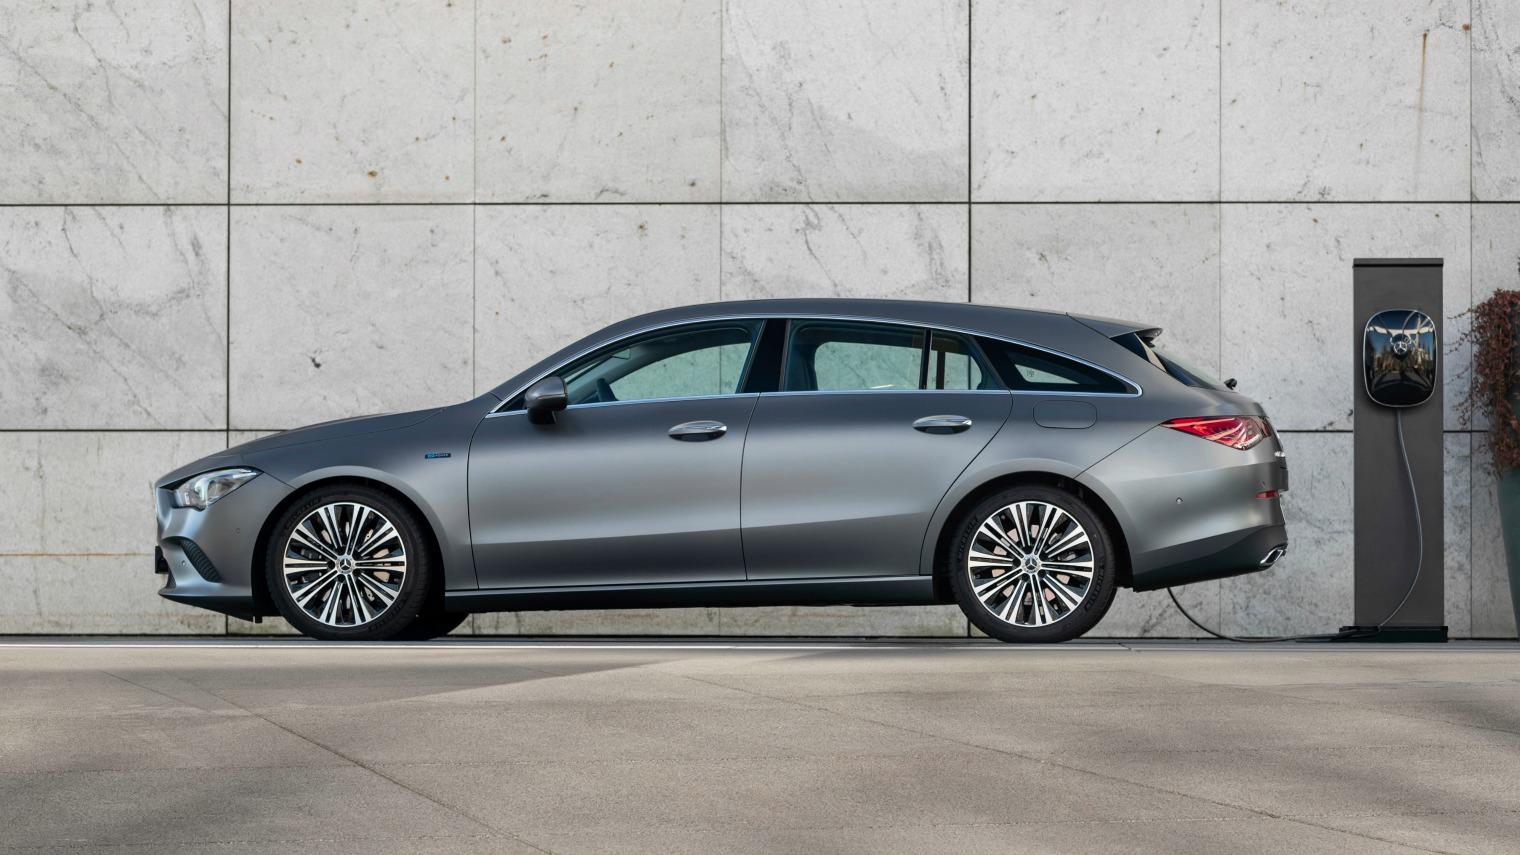 Nuova Mercedes CLA Shooting Brake ibrida plug-in 2020